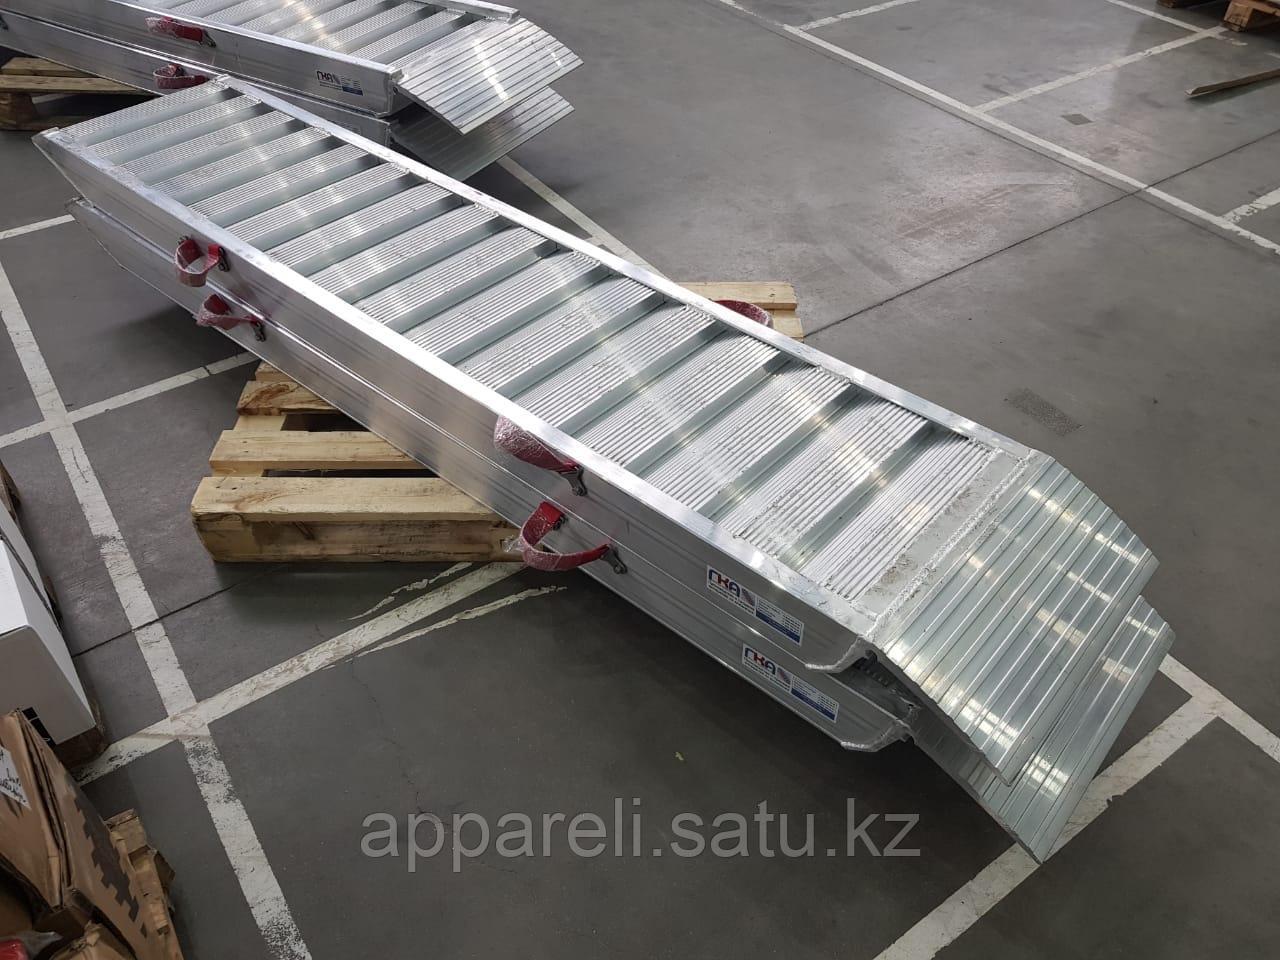 Алюминиевые аппарели от производителя 3 метра, 9,5 тонн